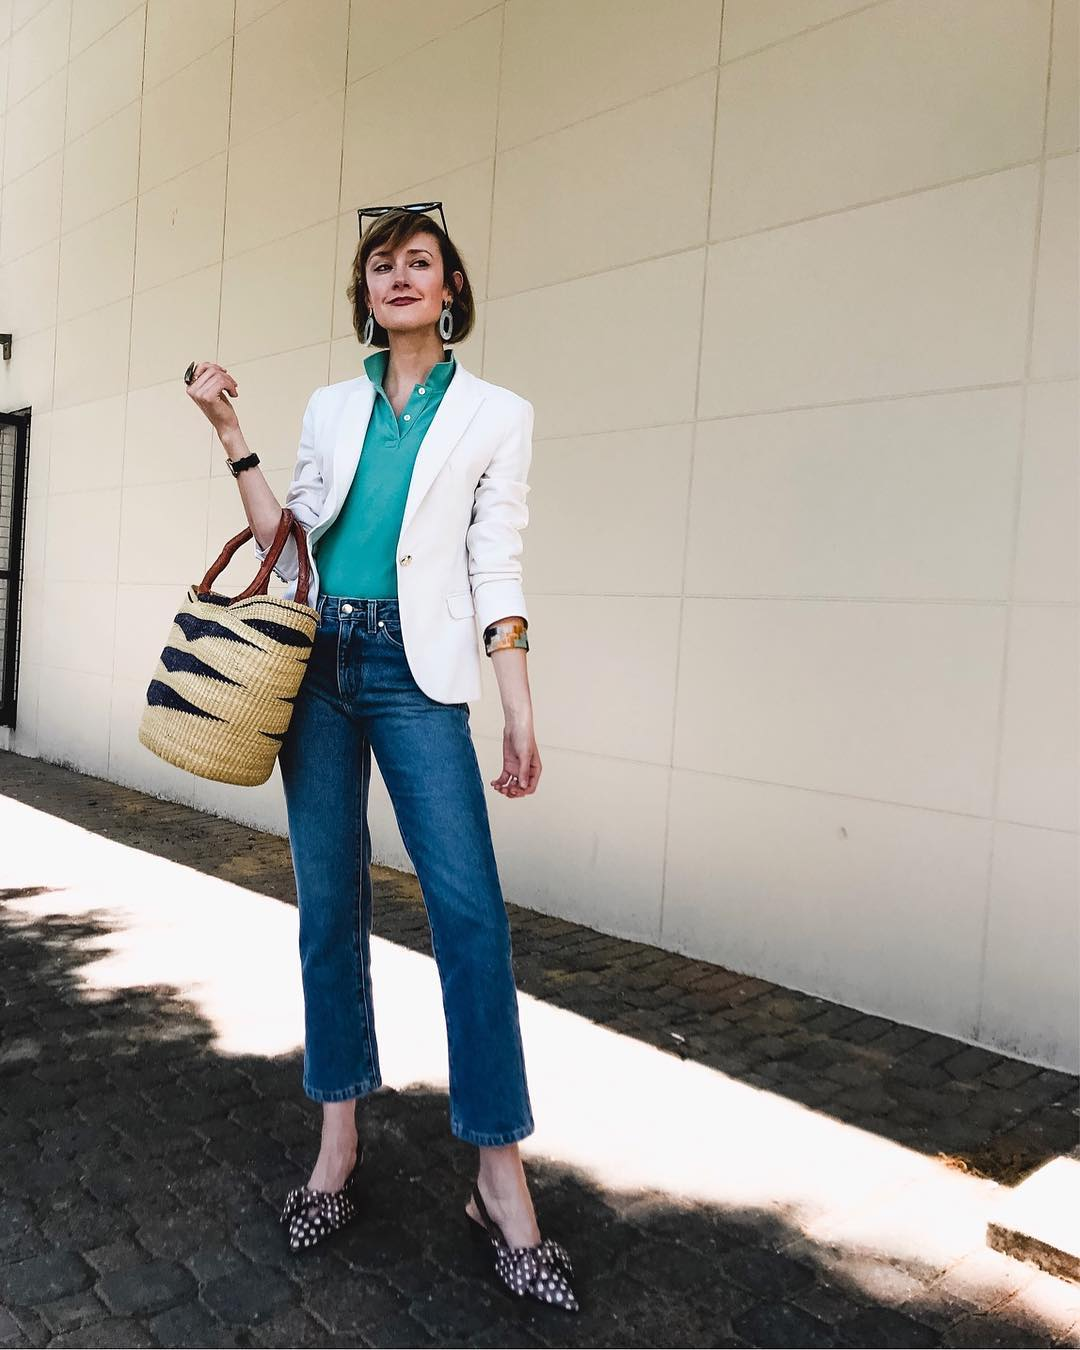 Zara blazer and Need Supply jeans